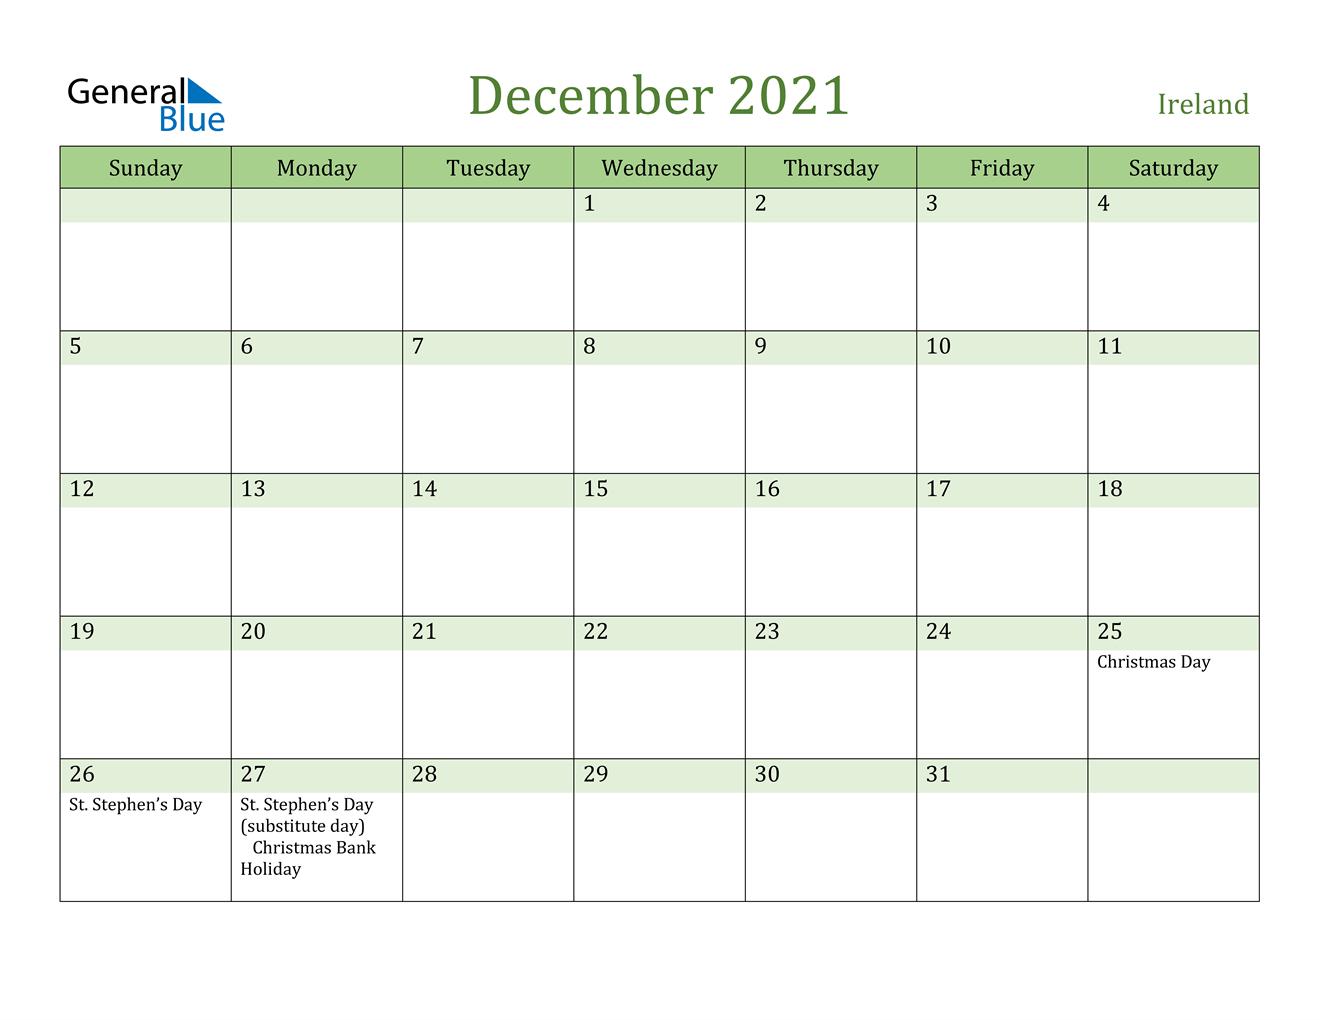 Ireland December 2021 Calendar With Holidays